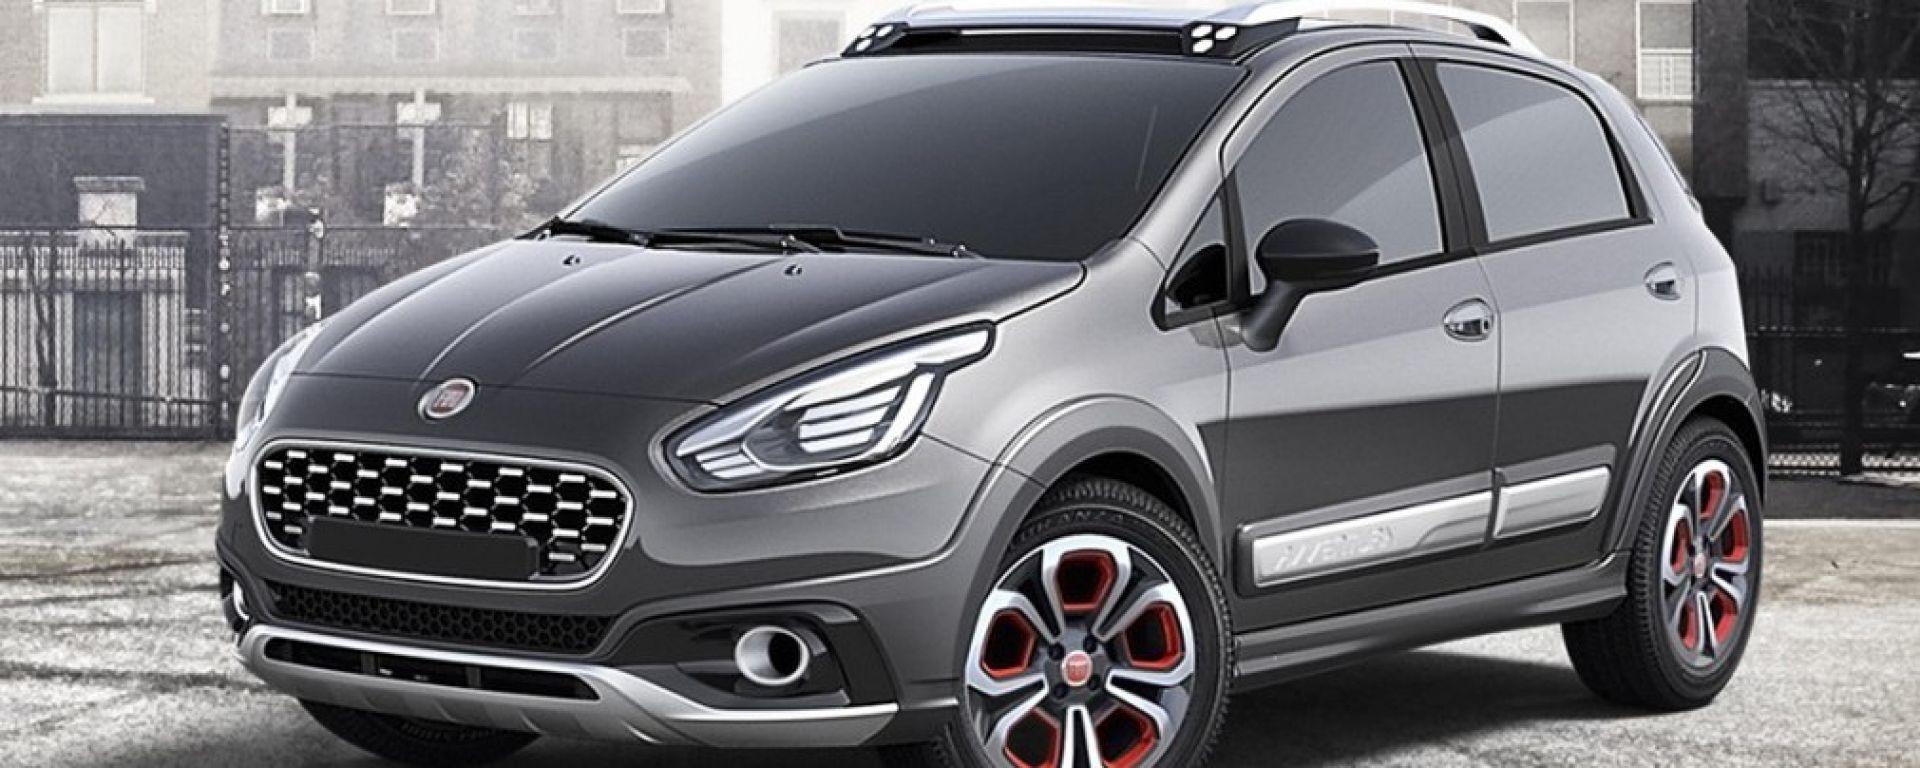 Concept: Fiat Punto Urban Cross - MotorBox on fiat 500l, fiat marea, fiat panda, fiat ritmo, fiat 500 turbo, fiat linea, fiat spider, fiat cinquecento, fiat 500 abarth, fiat seicento, fiat stilo, fiat x1/9, fiat coupe, fiat barchetta, fiat multipla, fiat cars, fiat doblo, fiat bravo,